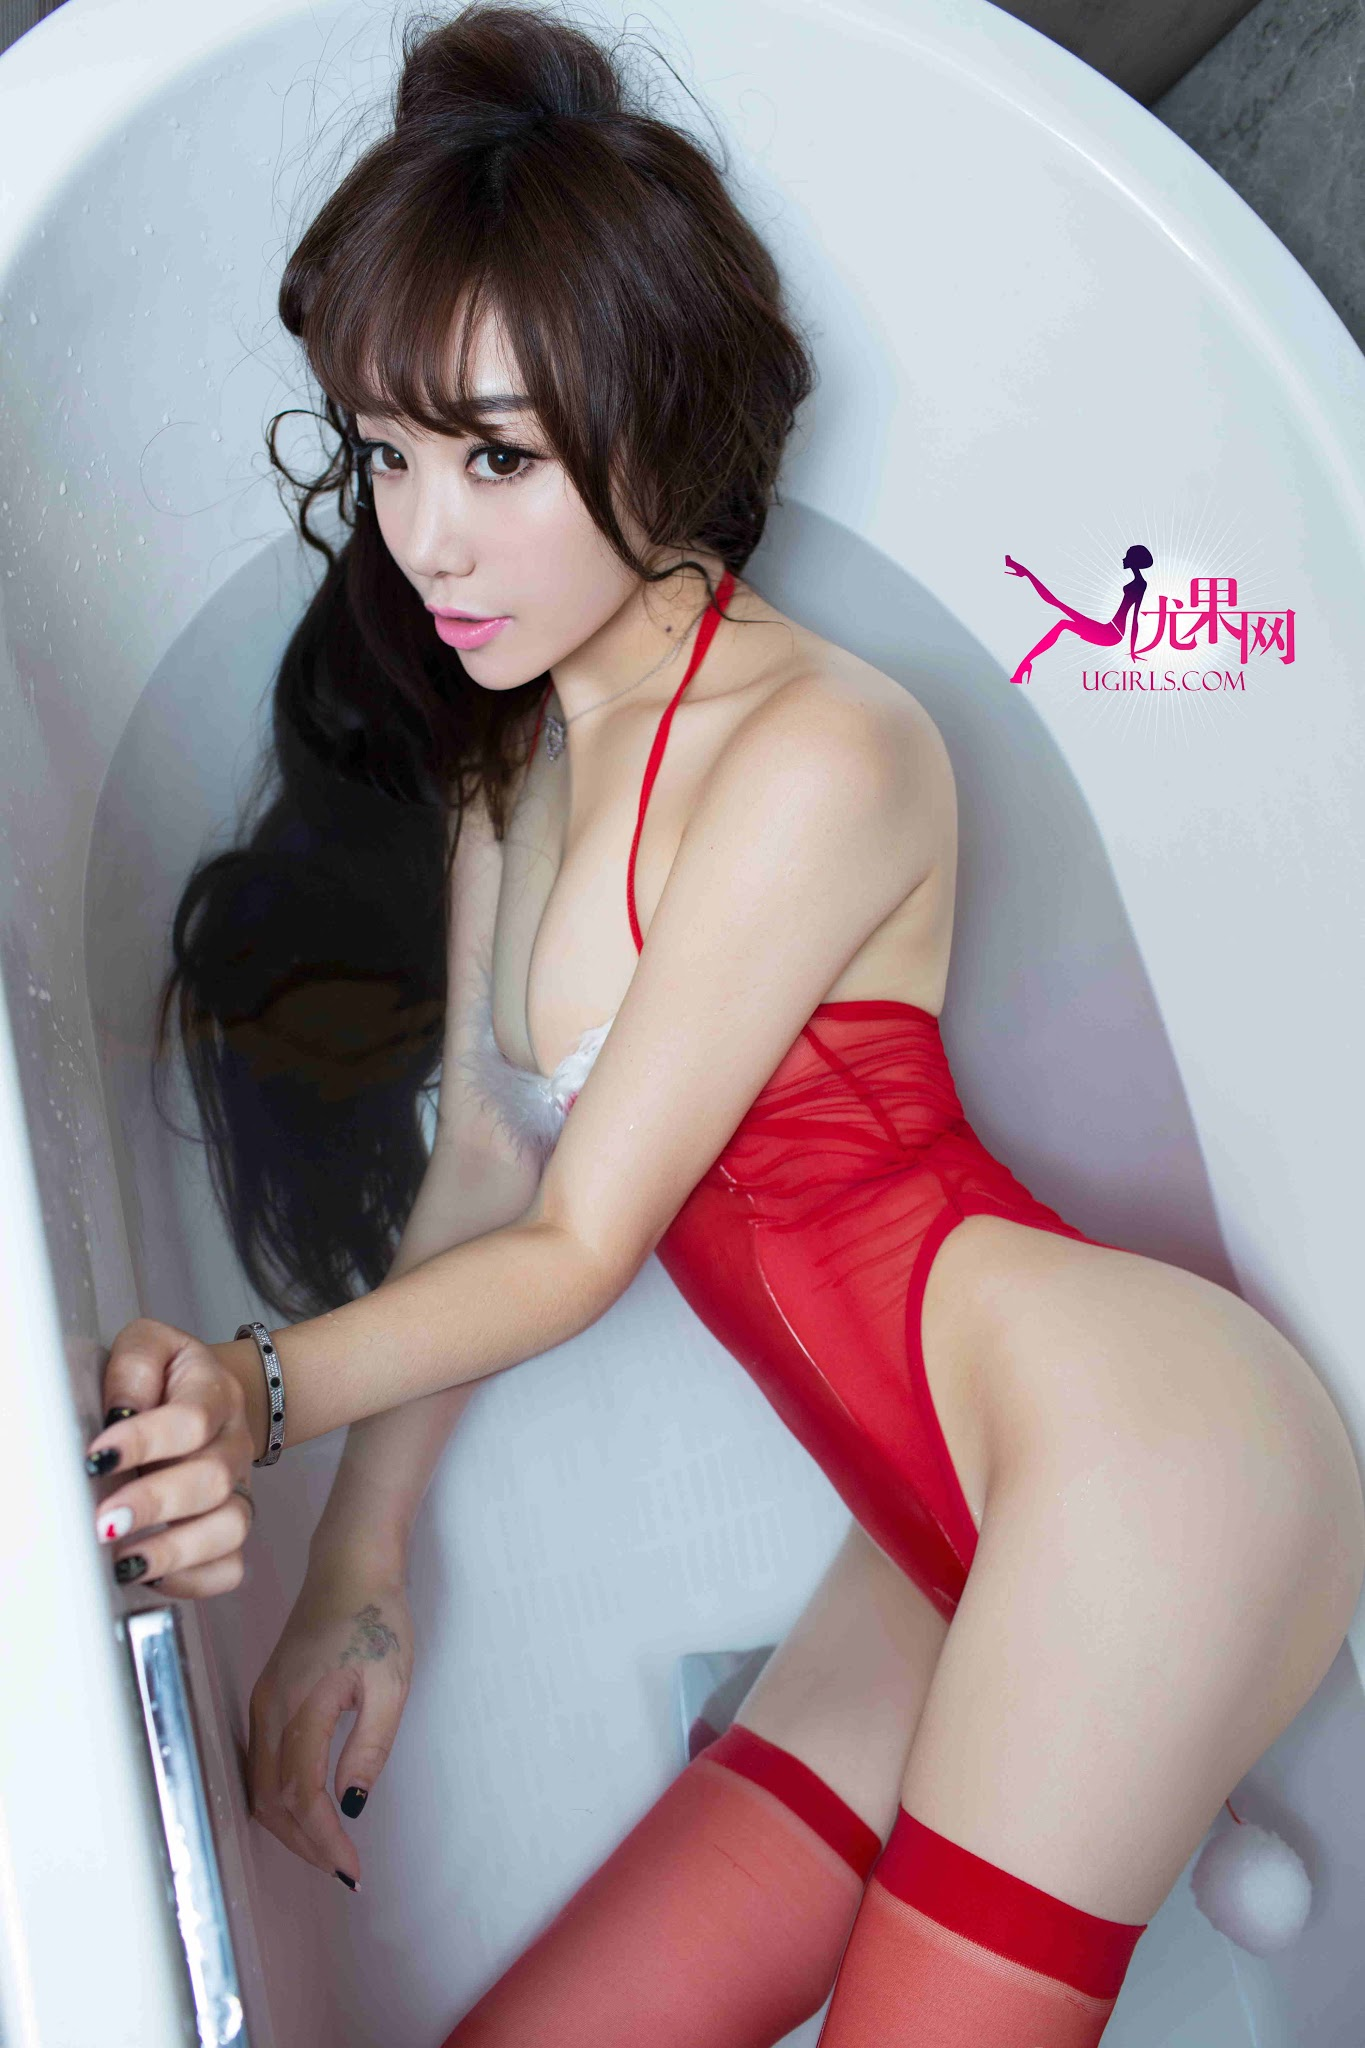 Han Yu Fei 韩雨菲 uHD Naked Cosplayer on 尤果网 | | GravureGirlz